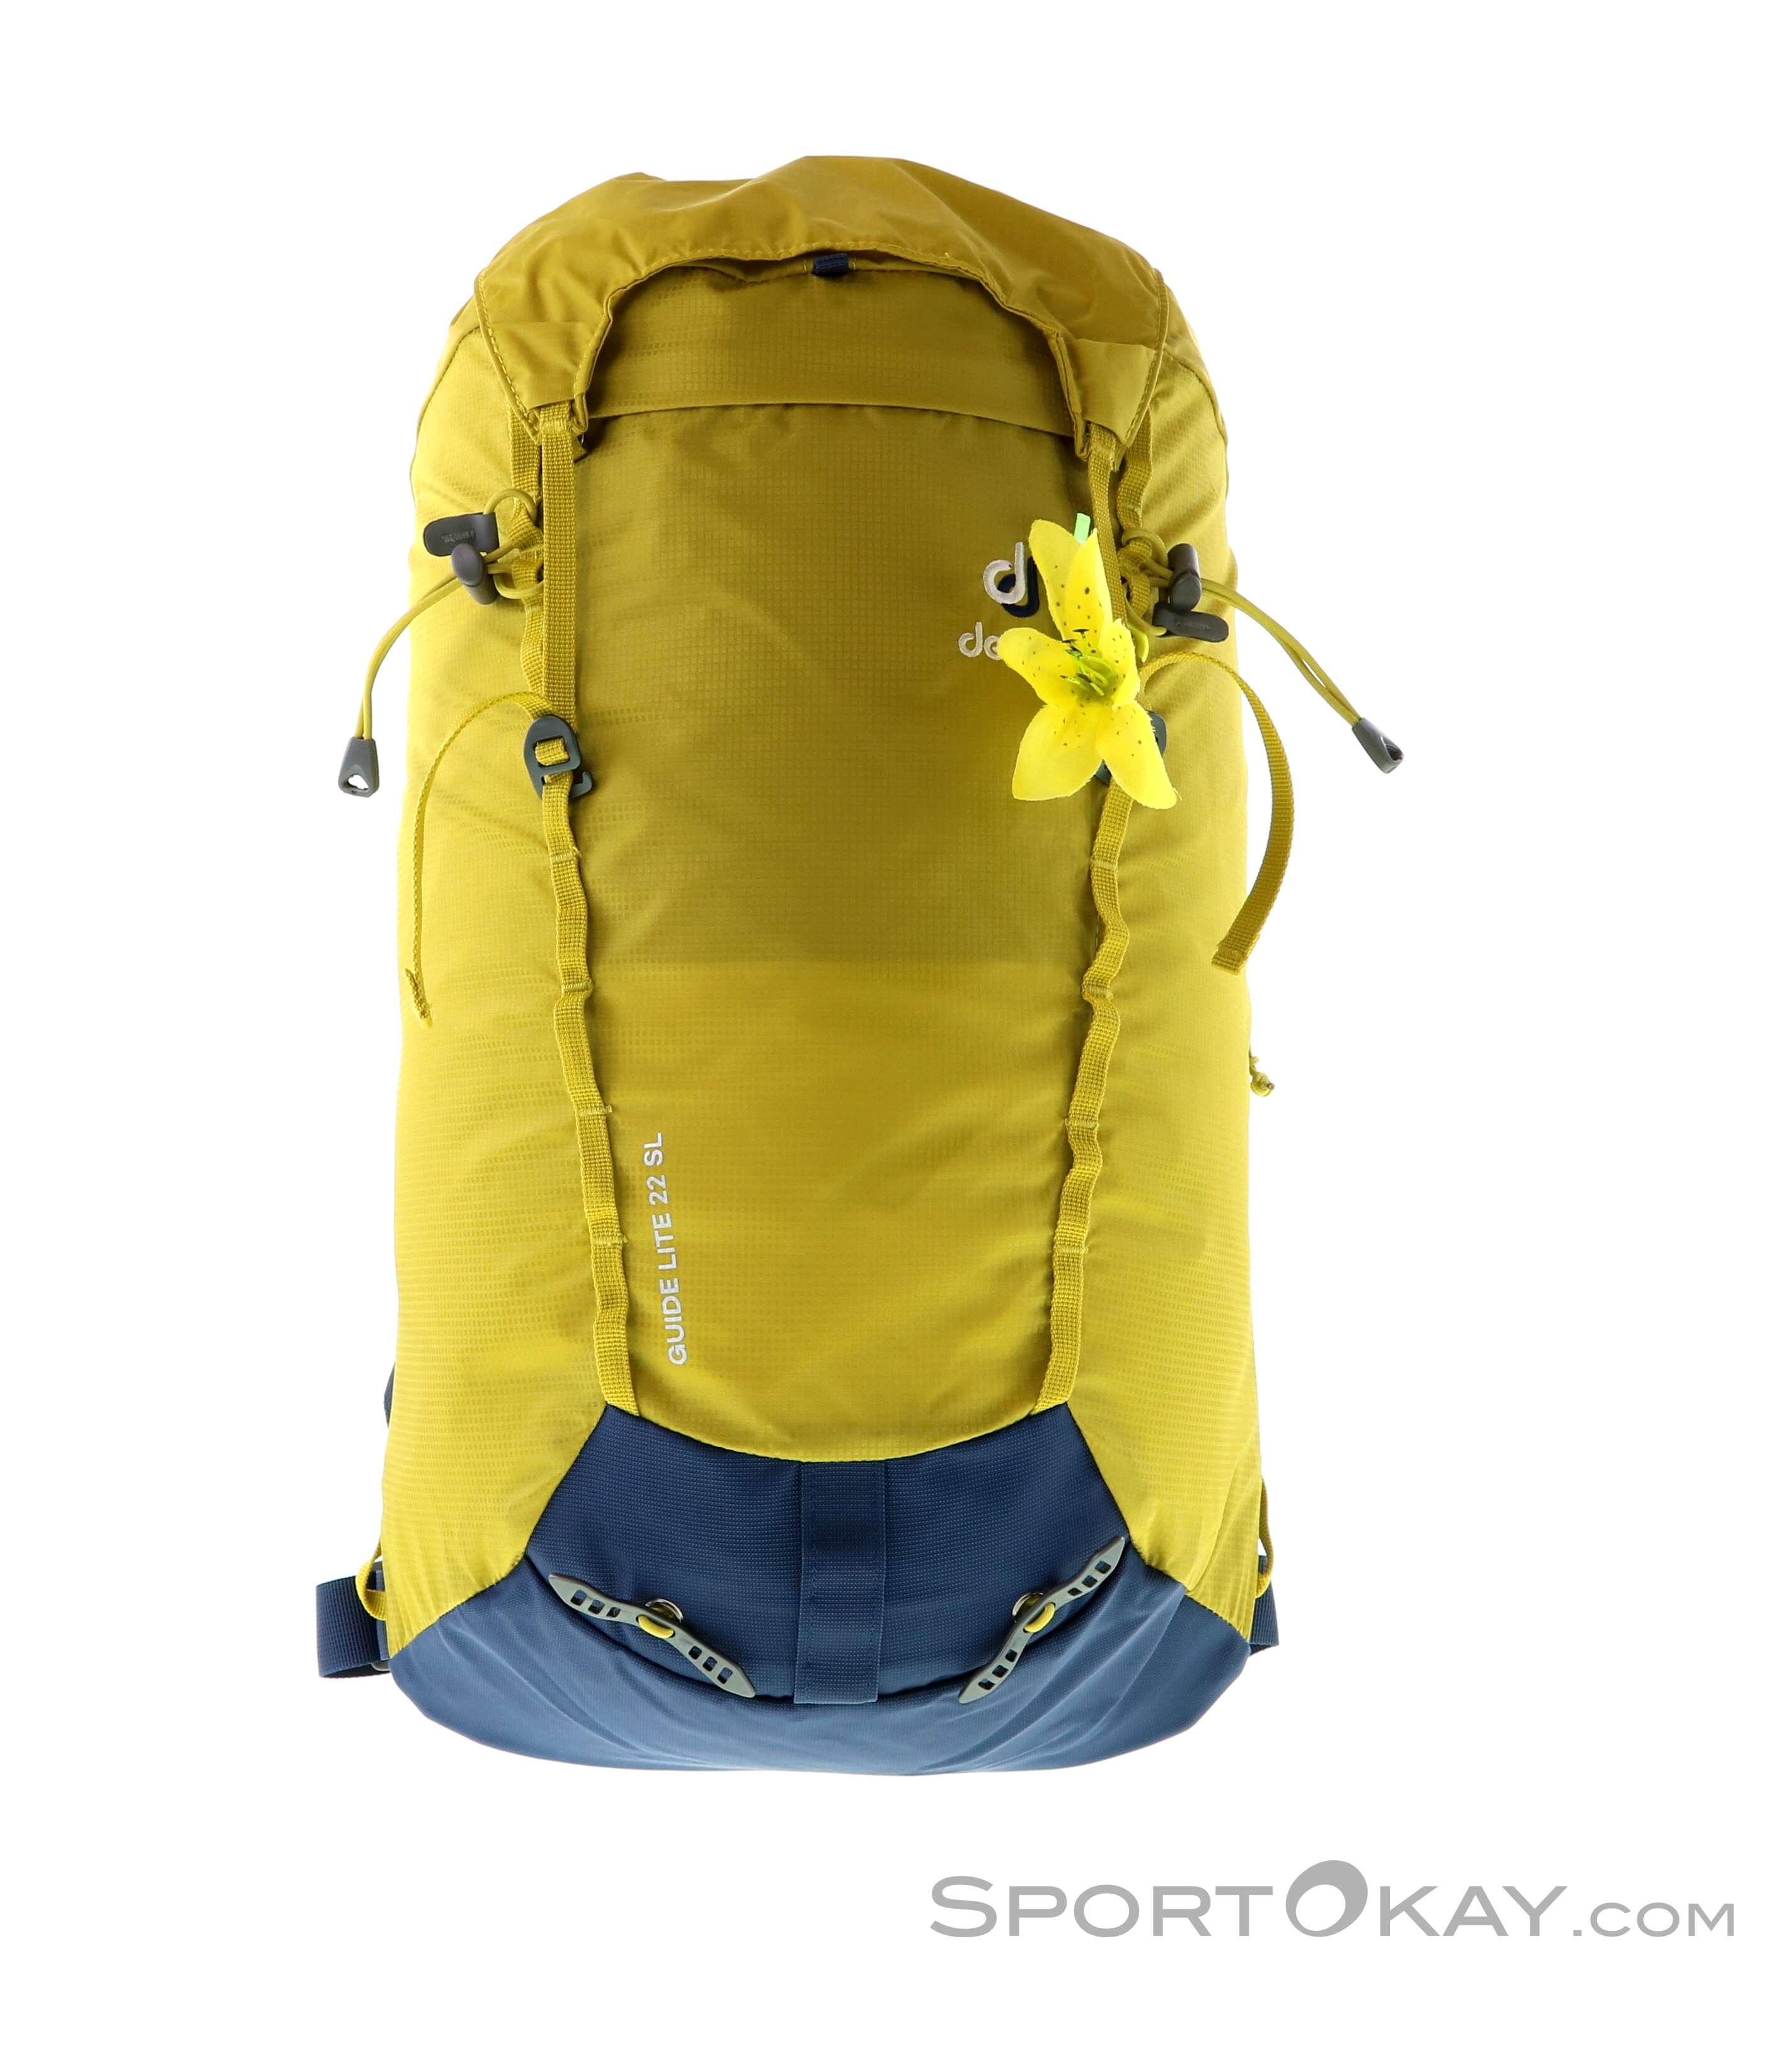 Deuter Guide Lite señoraseñores mochila skirucksack wanderruscksack trekking